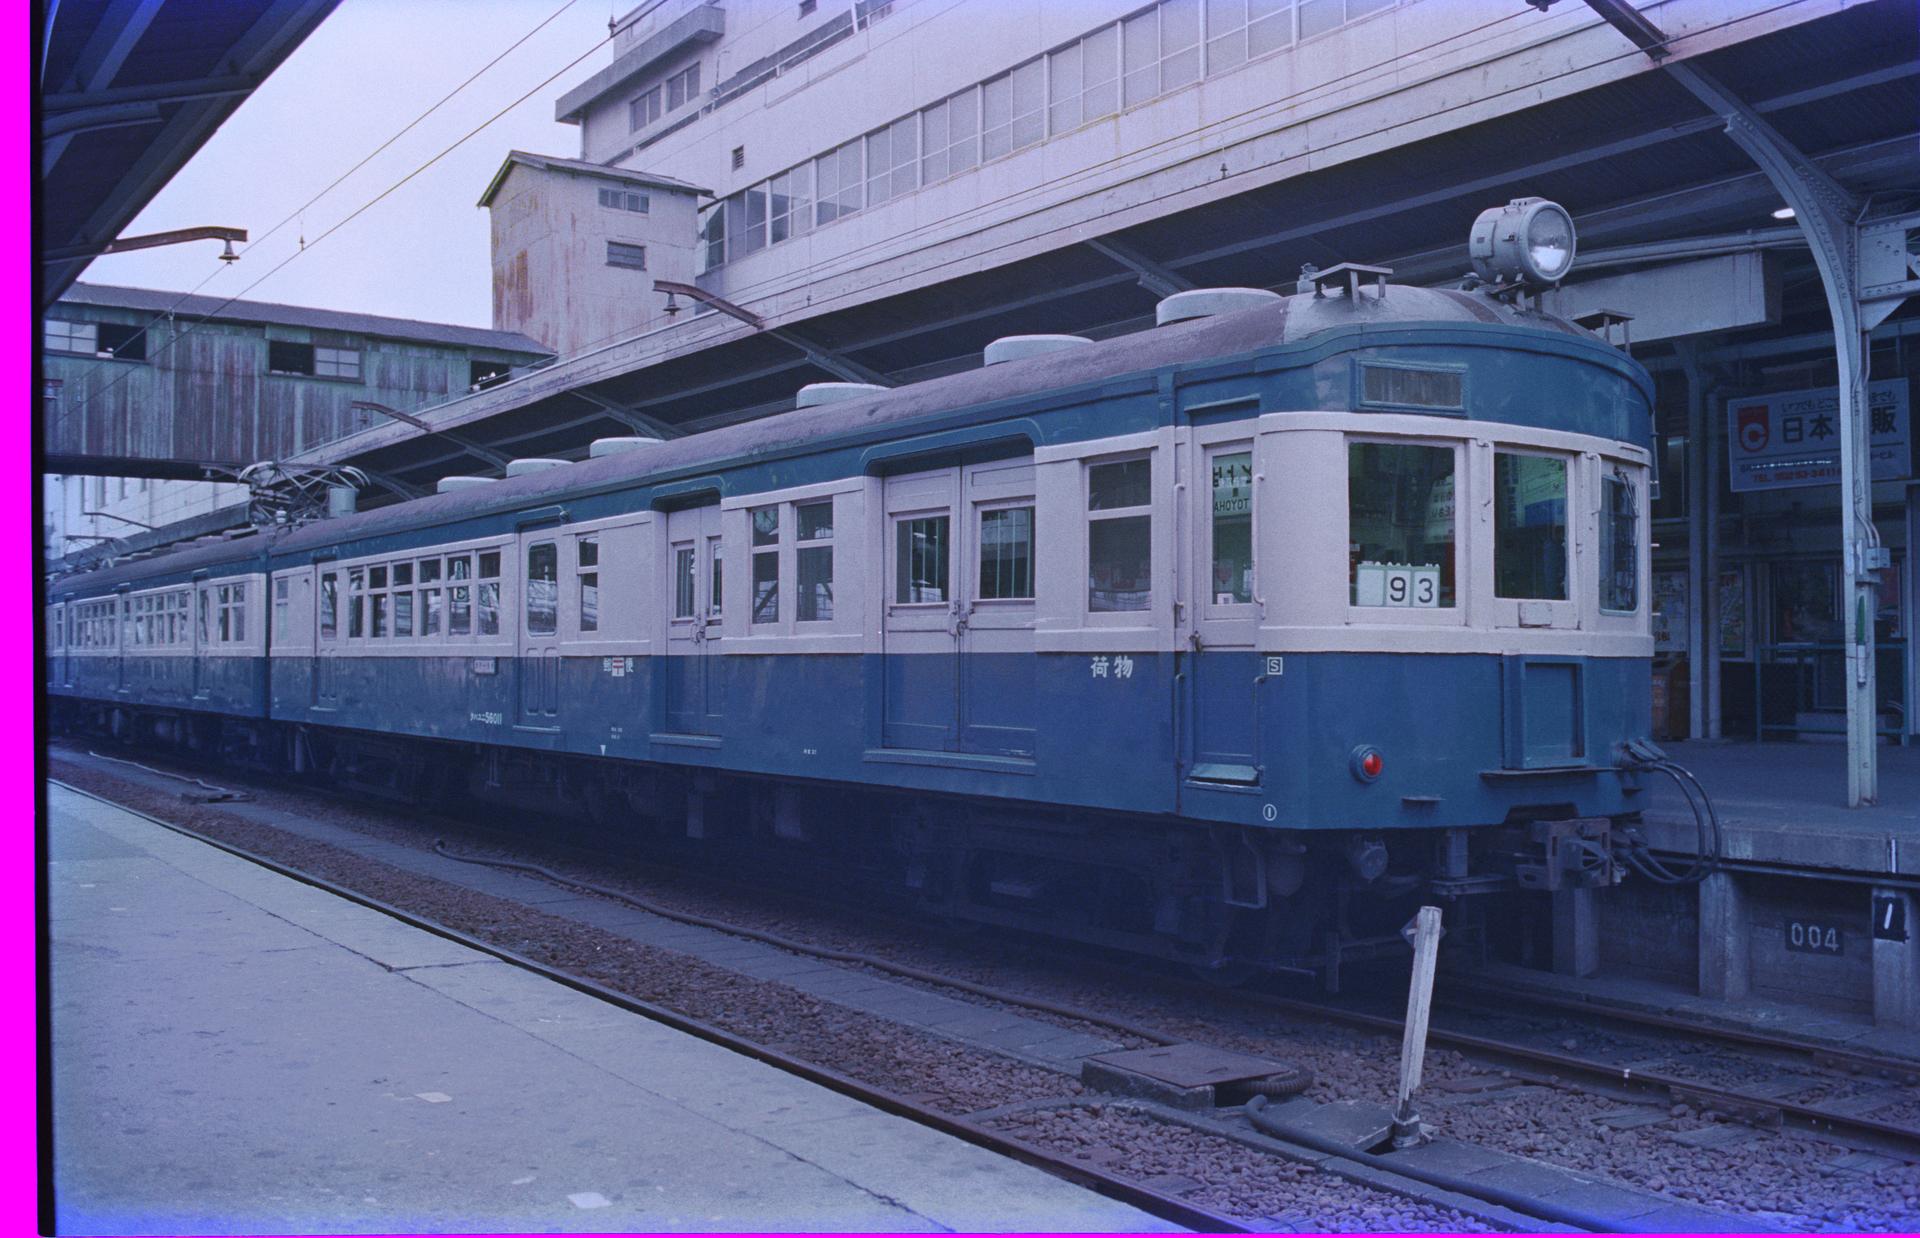 f:id:yasuo_ssi:20201110215754j:plain